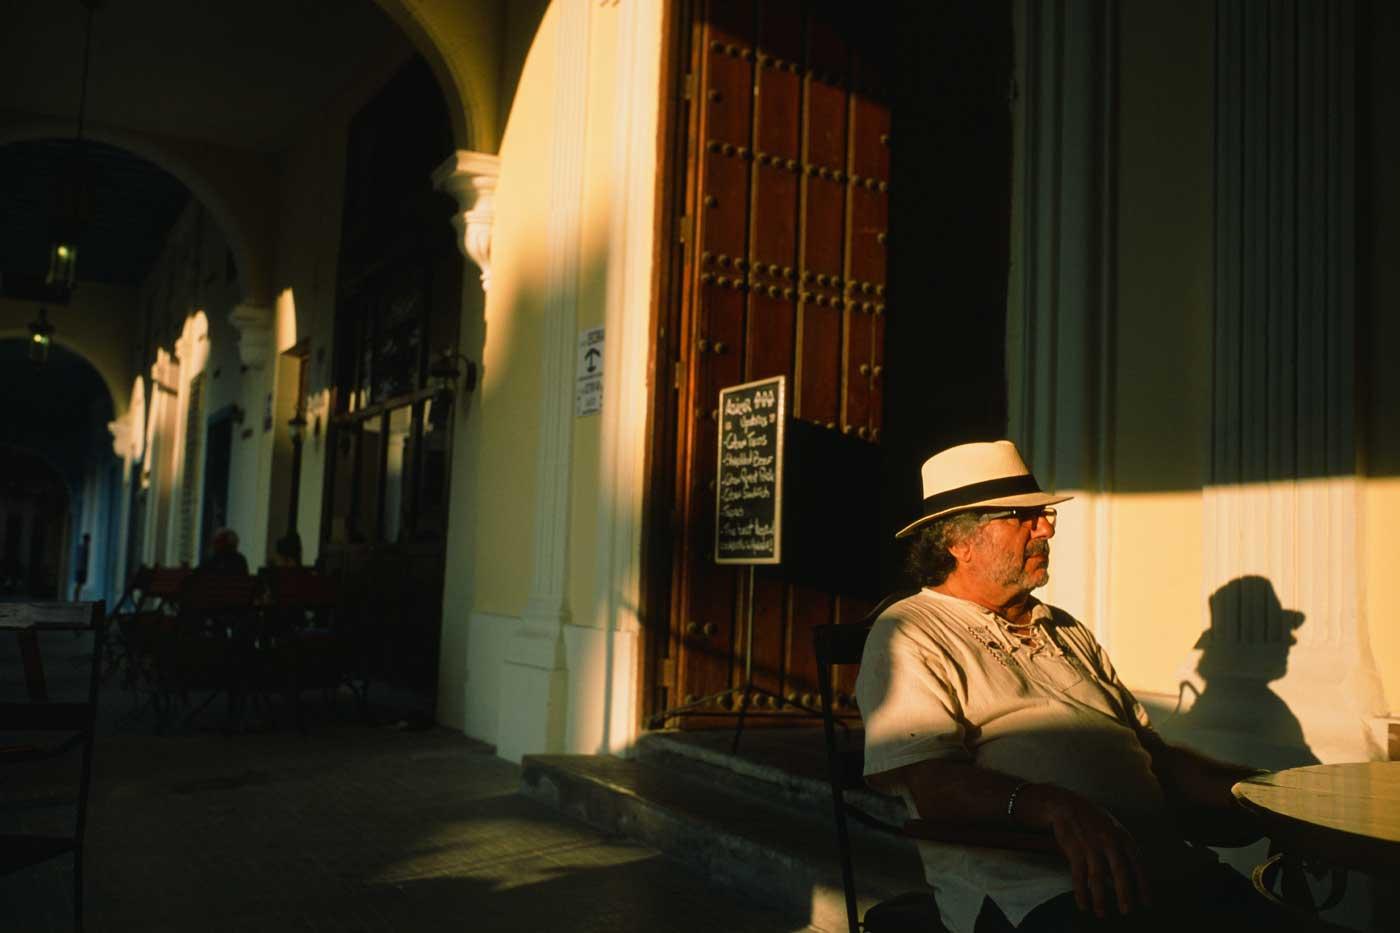 Leica-summicron-35mm-f2-35-iv-v4-pre-a-pre-asph-canada-made-e39-lens-review-gear-street-photography-7-elements-king-of-bokeh-kob-dof-fuji-fujifilm-RDPIII-provia-slide-reversal-cuba-havana-portrait